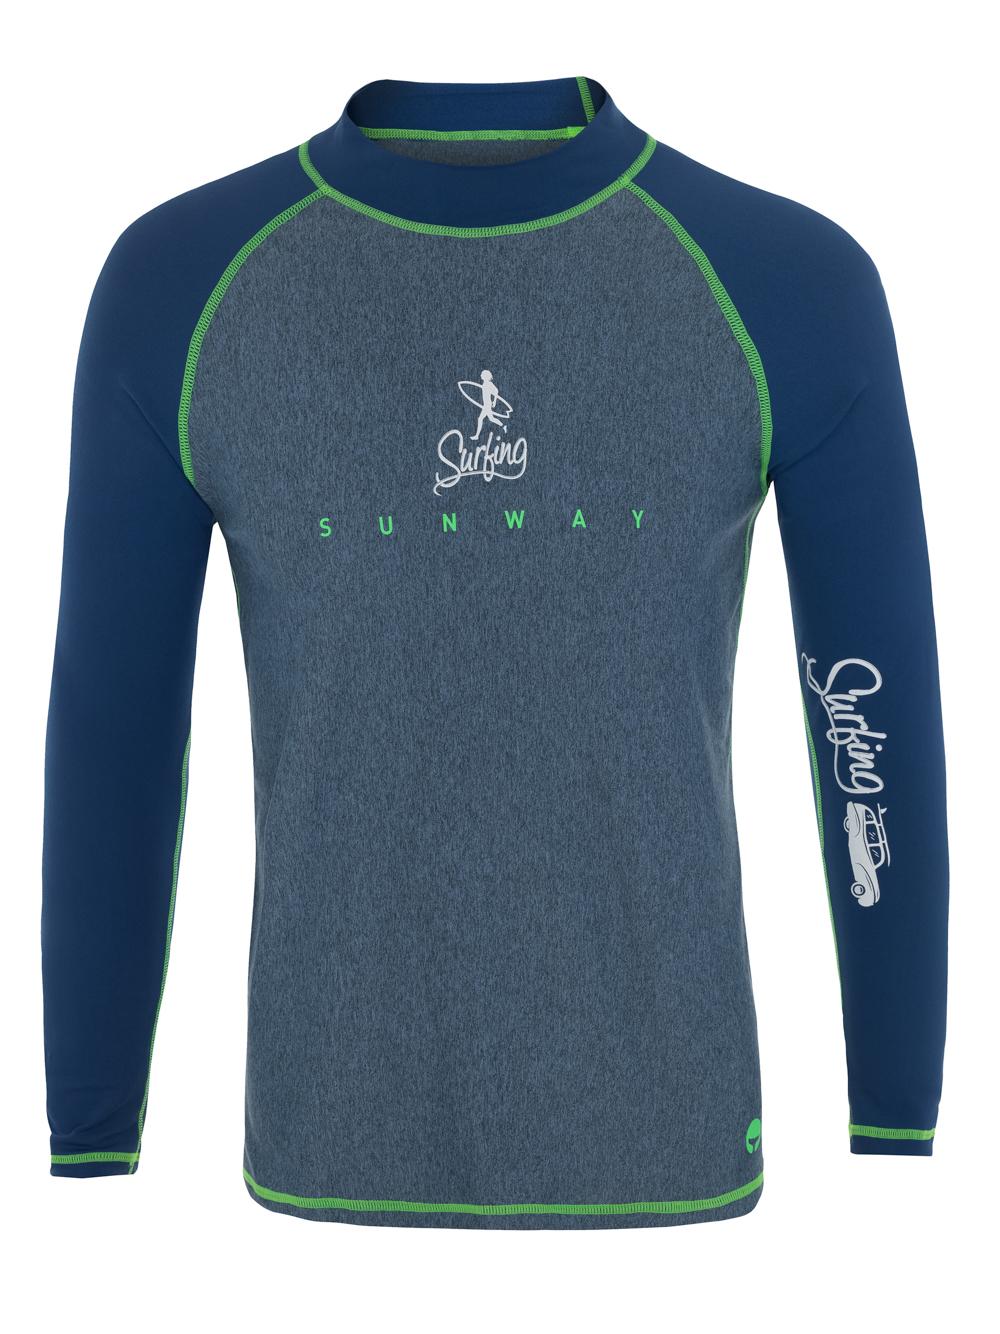 Men's Long-Sleeves Rash Guard Shirt UPF50+ 60163